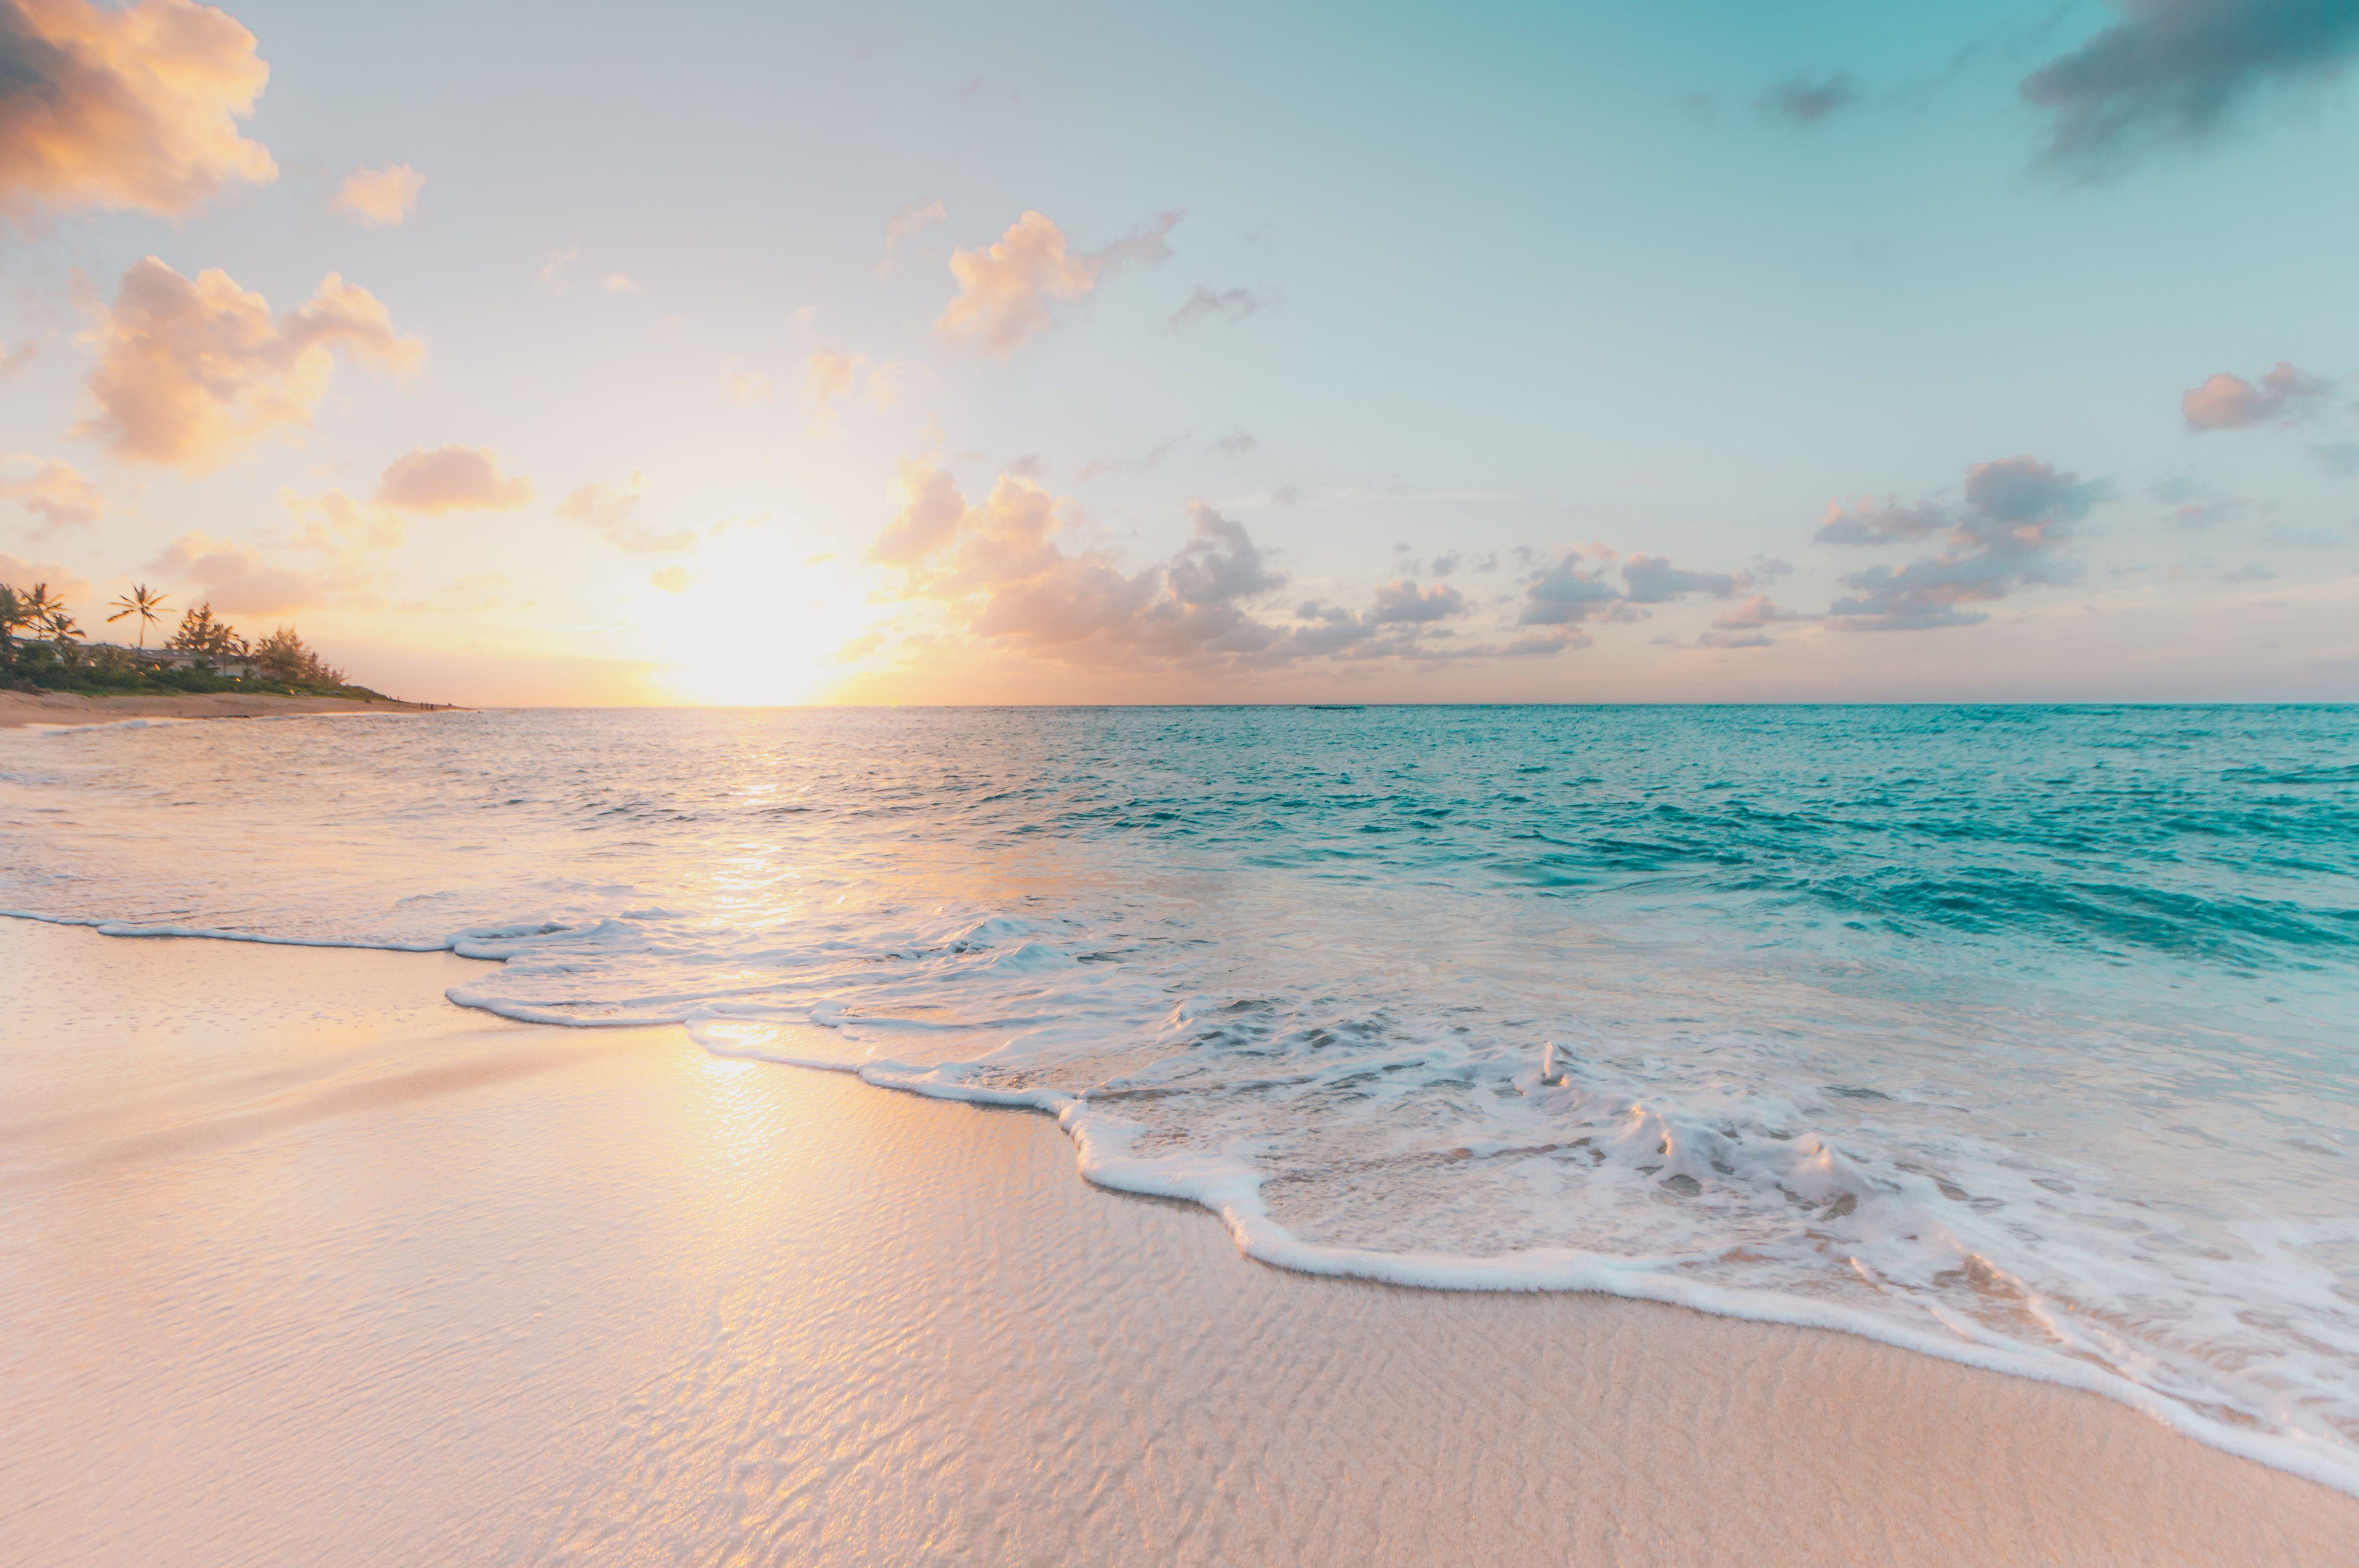 3K Ocean Beach Wallpapers   Top 3K Ocean Beach Backgrounds 4621x3072